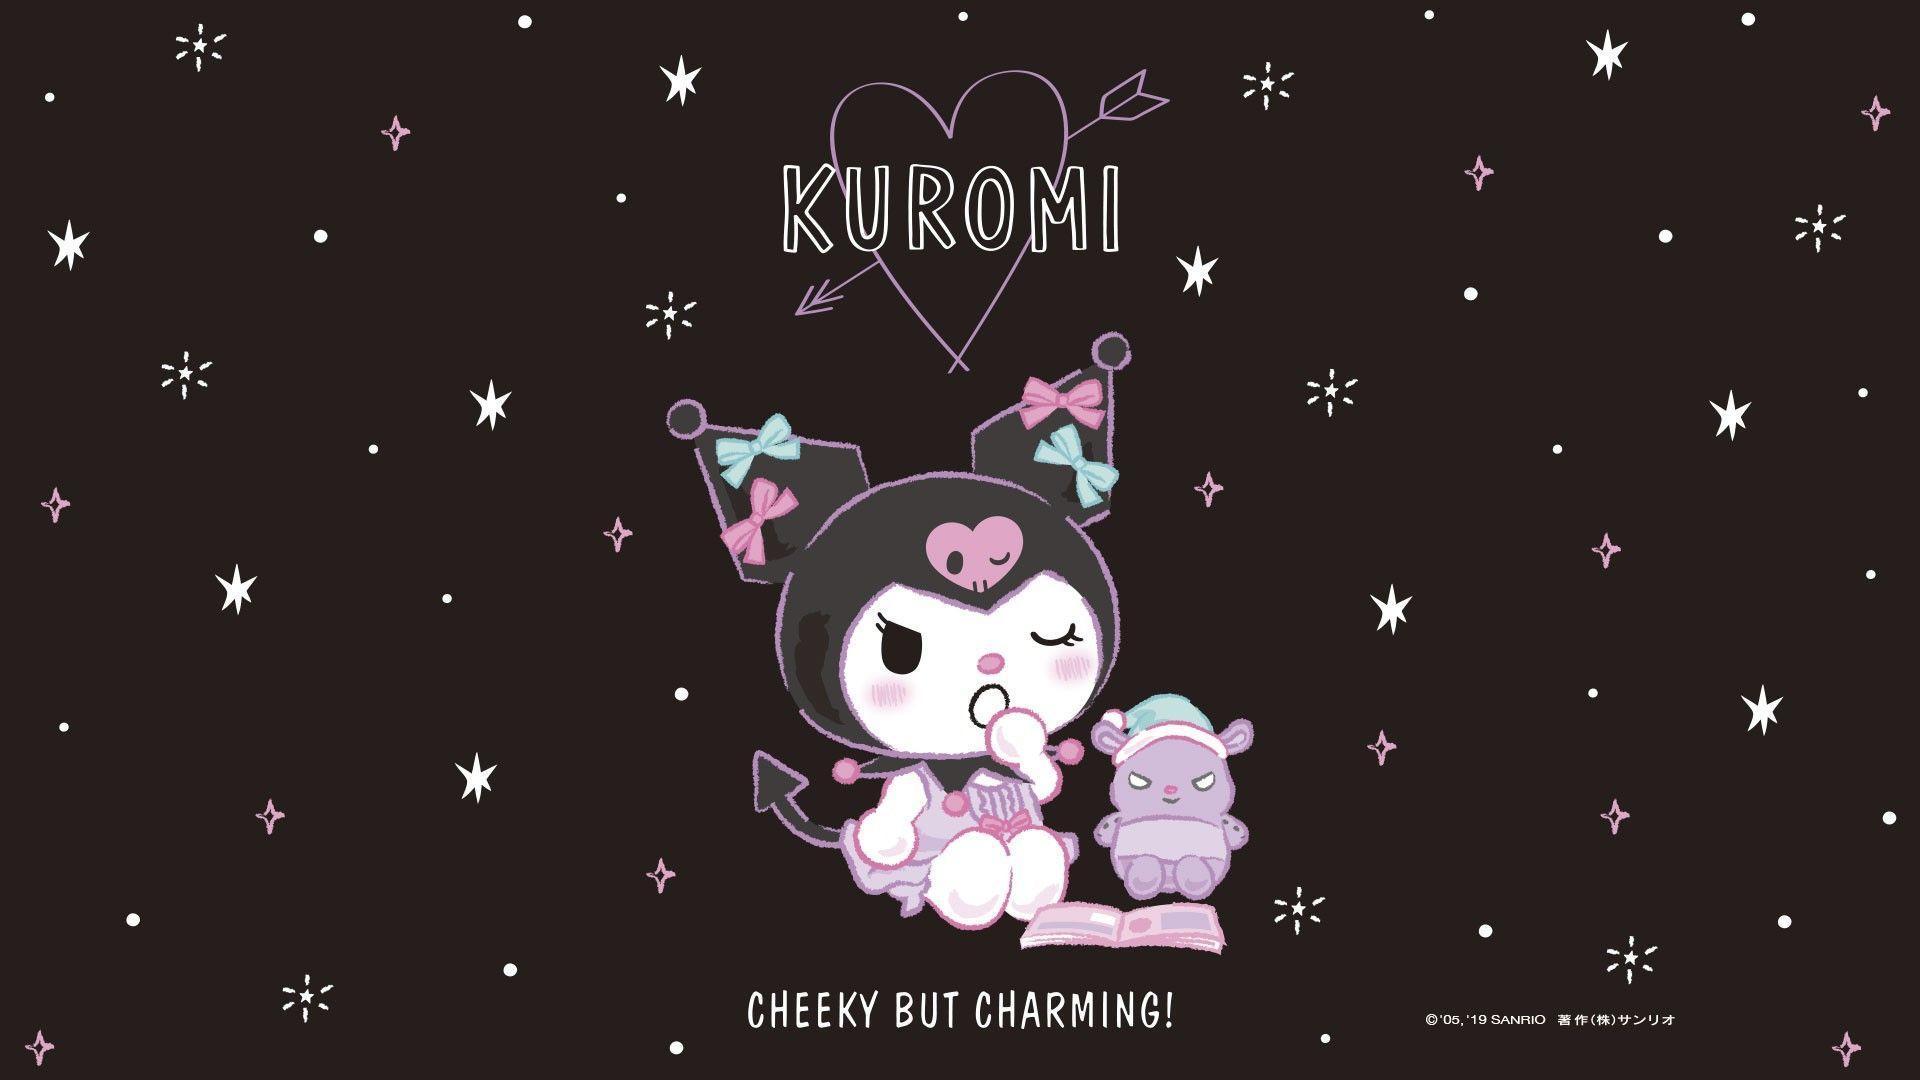 Films en vf ou vostfr et bien sûr en hd. Kuromi Desktop Wallpapers - Top Free Kuromi Desktop ...